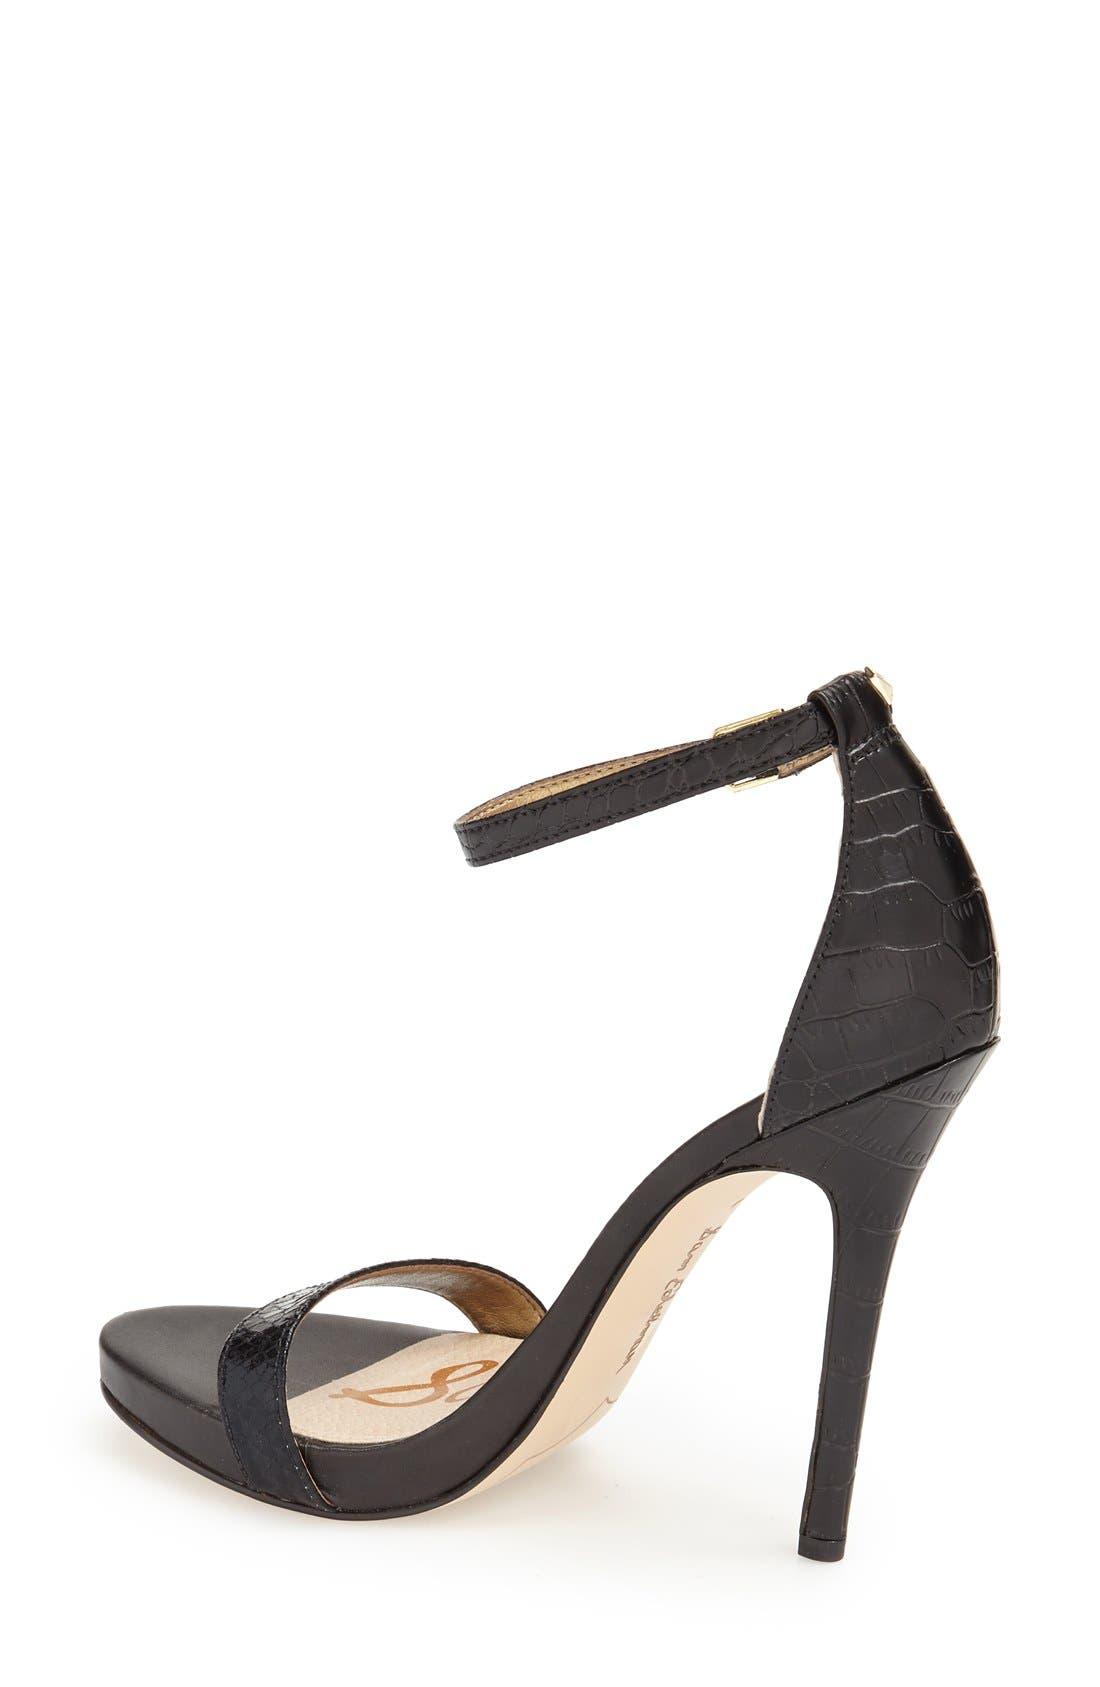 ,                             'Eleanor' Ankle Strap Sandal,                             Alternate thumbnail 38, color,                             007